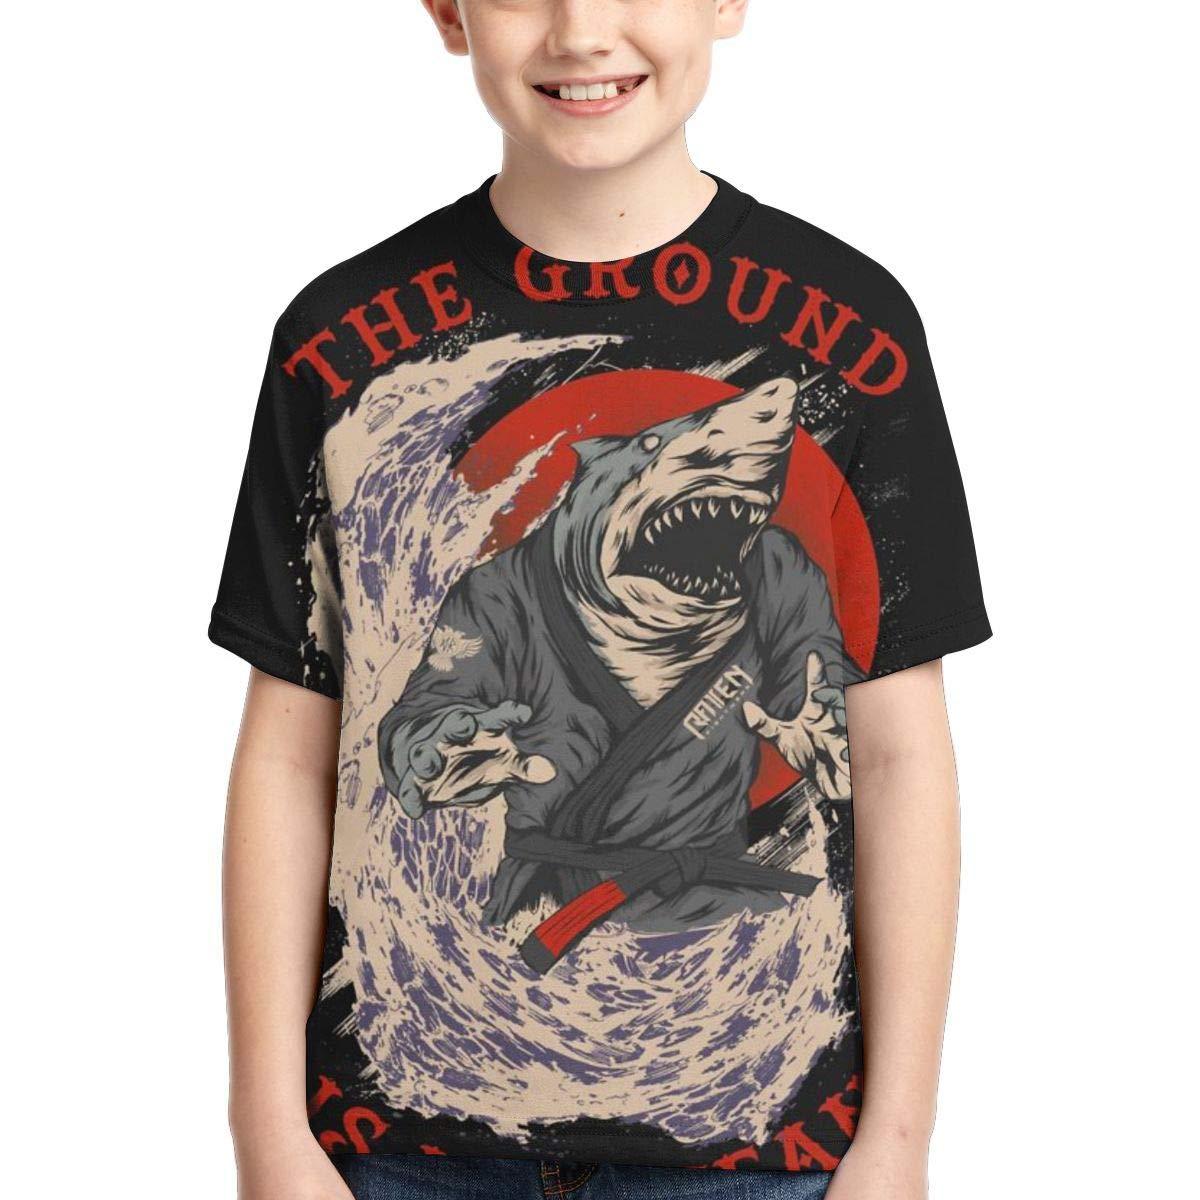 Boys Short Sleeve Samurai Shark The Ground is My Ocean 3D Printed T Shirt for Kids Cool Casual Top